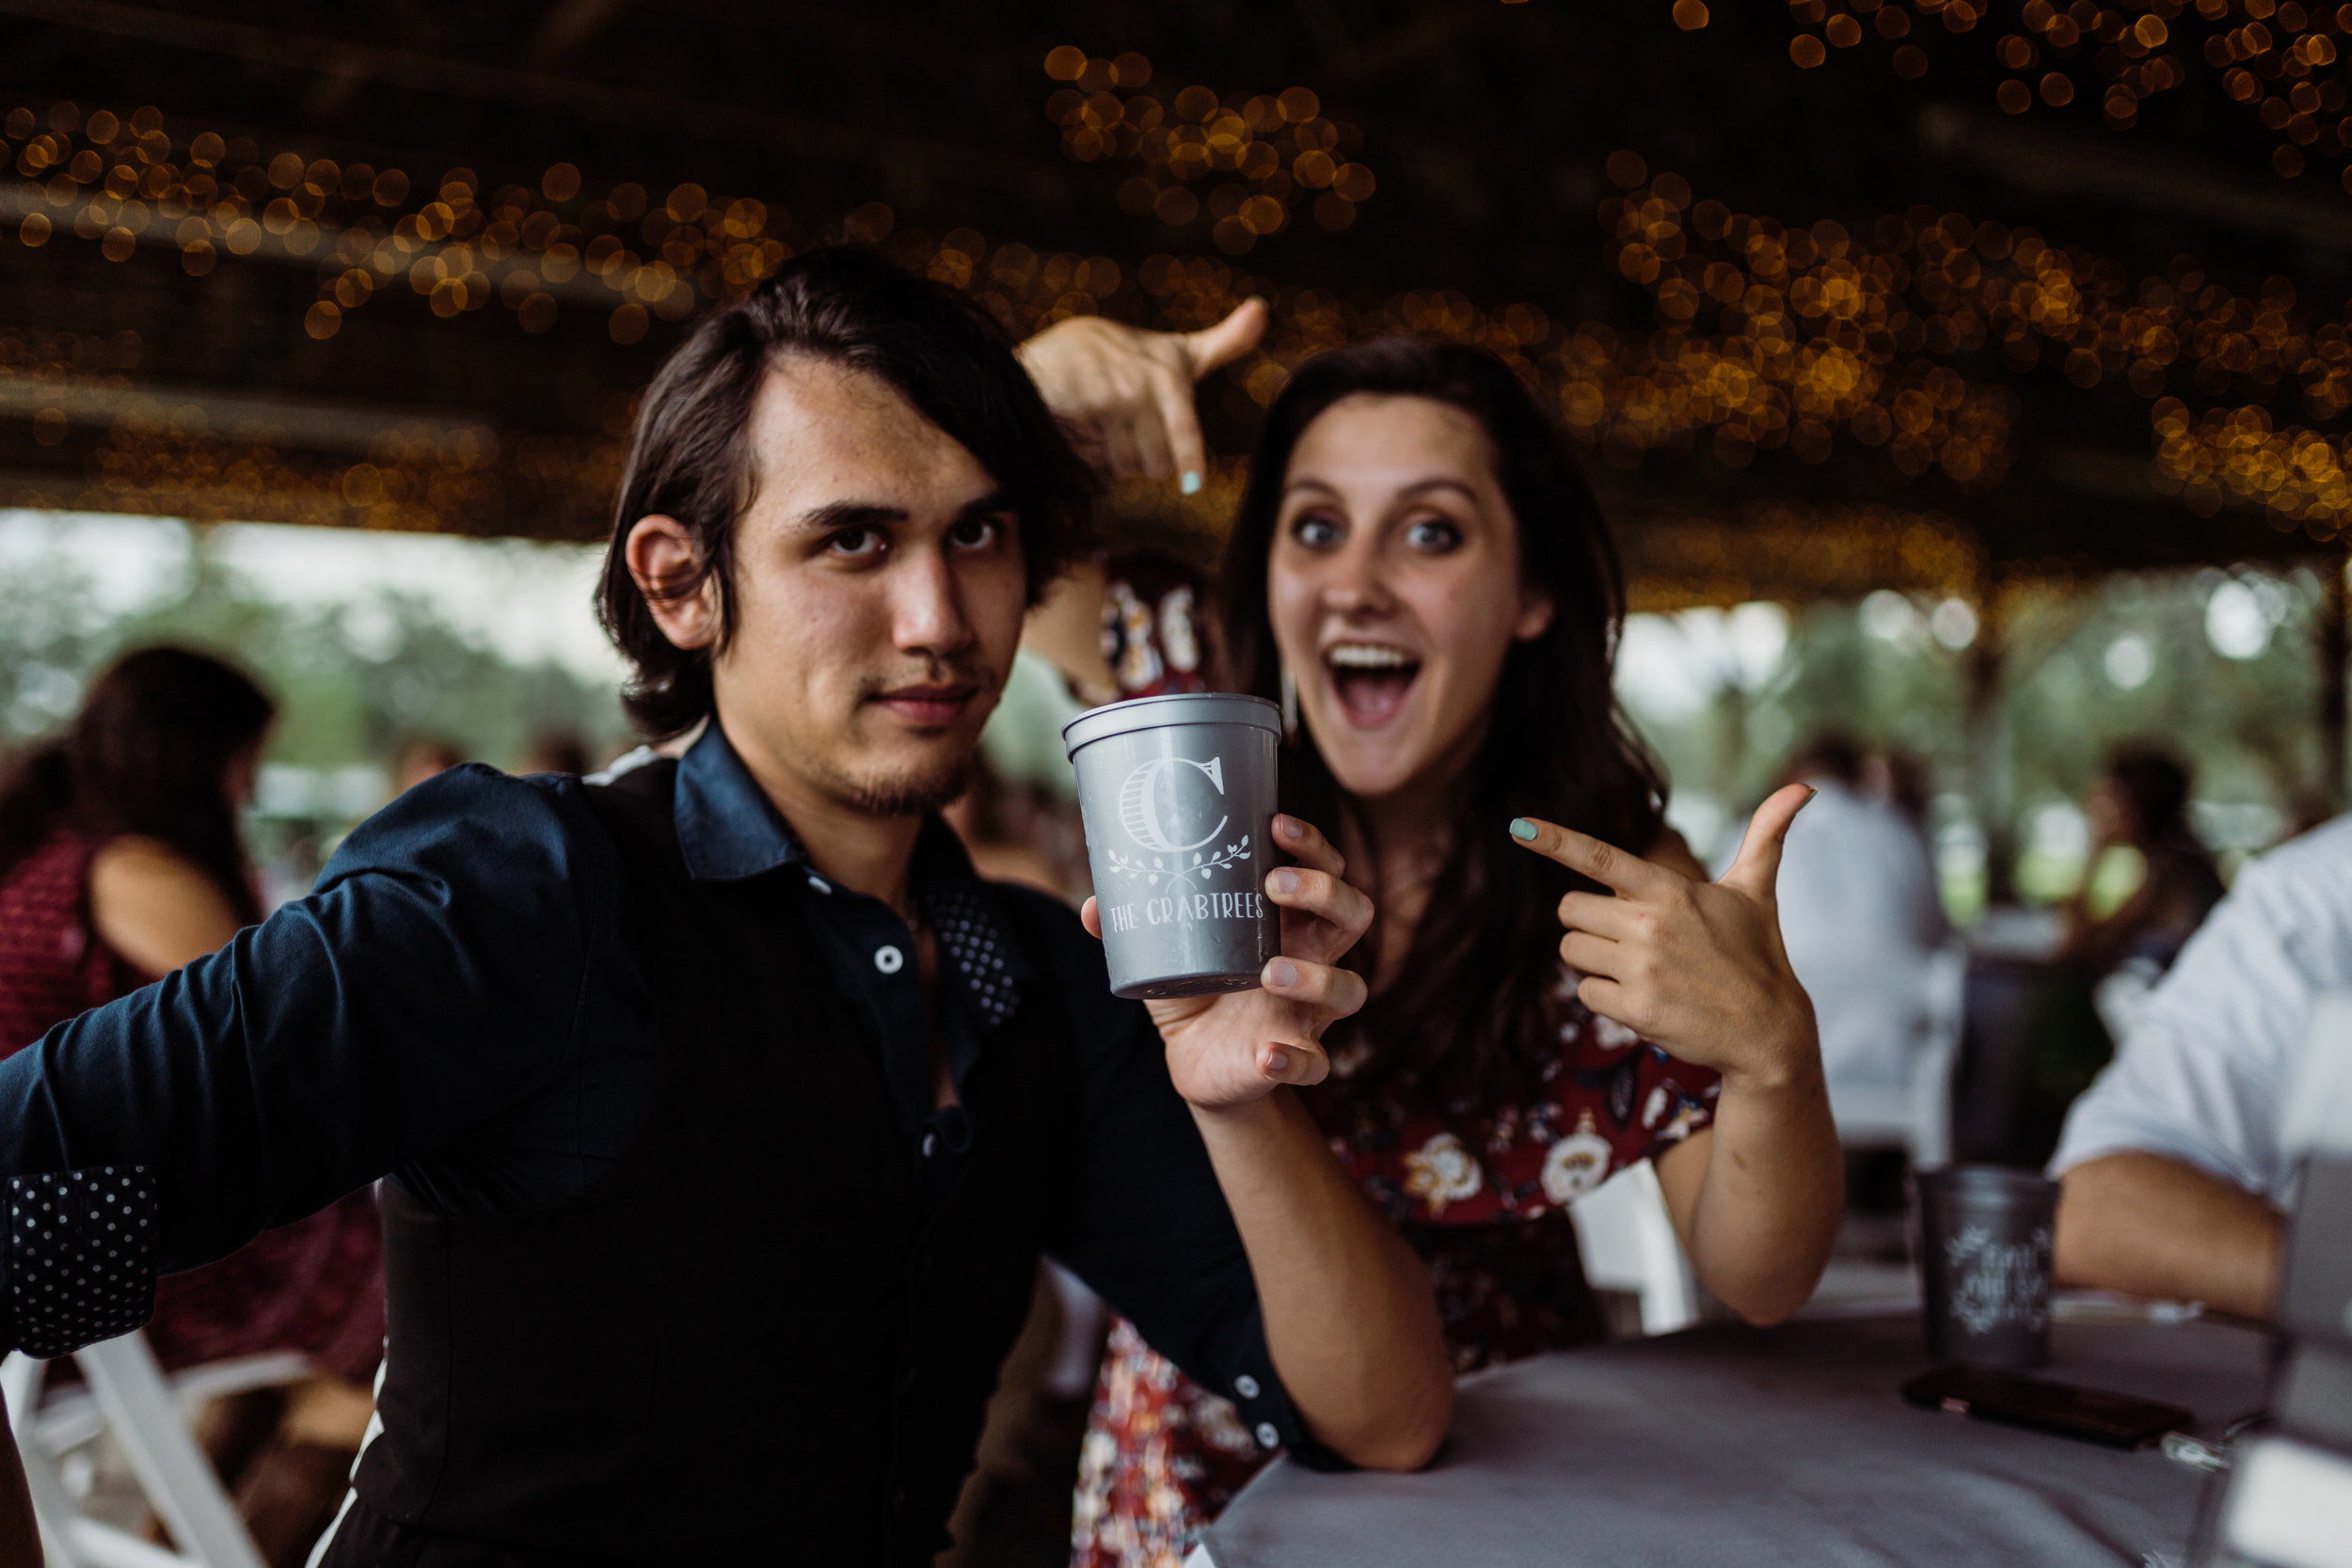 2017.10.14 Samantha and Matthew Crabtree Sarasota Wedding (486 of 708).jpg